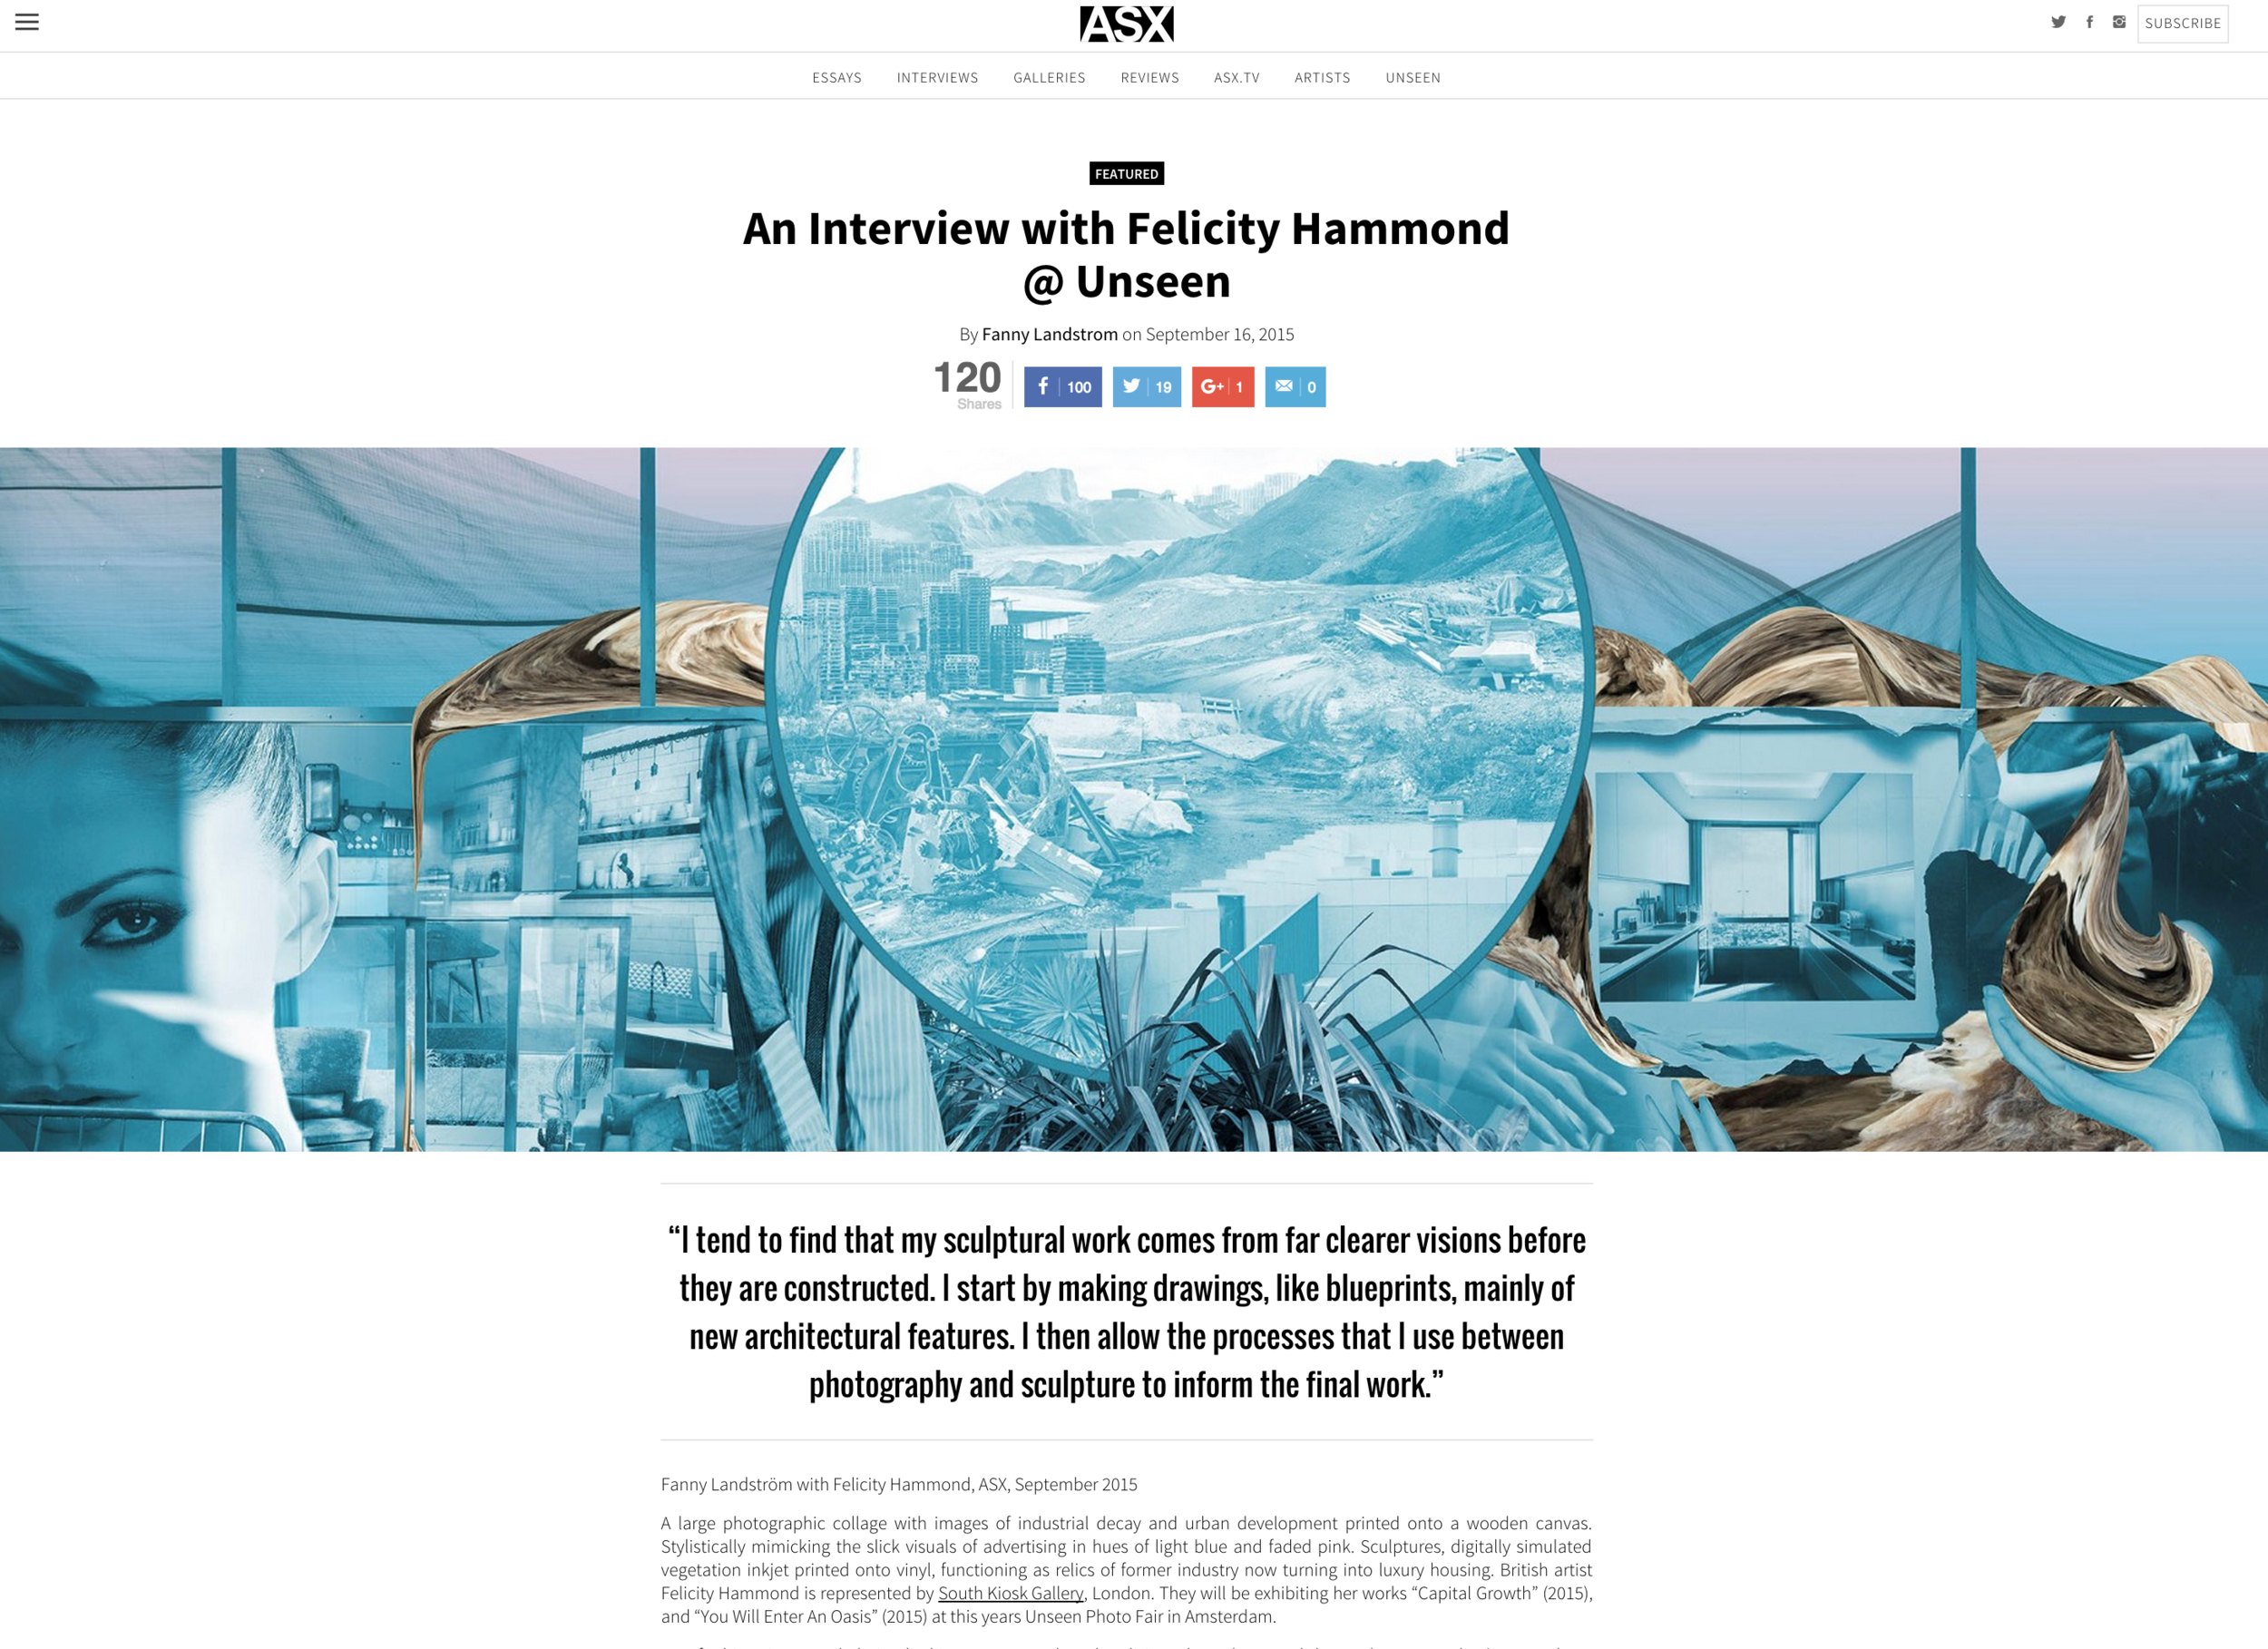 http://www.americansuburbx.com/2015/09/an-interview-with-felicity-hammond-unseen.html